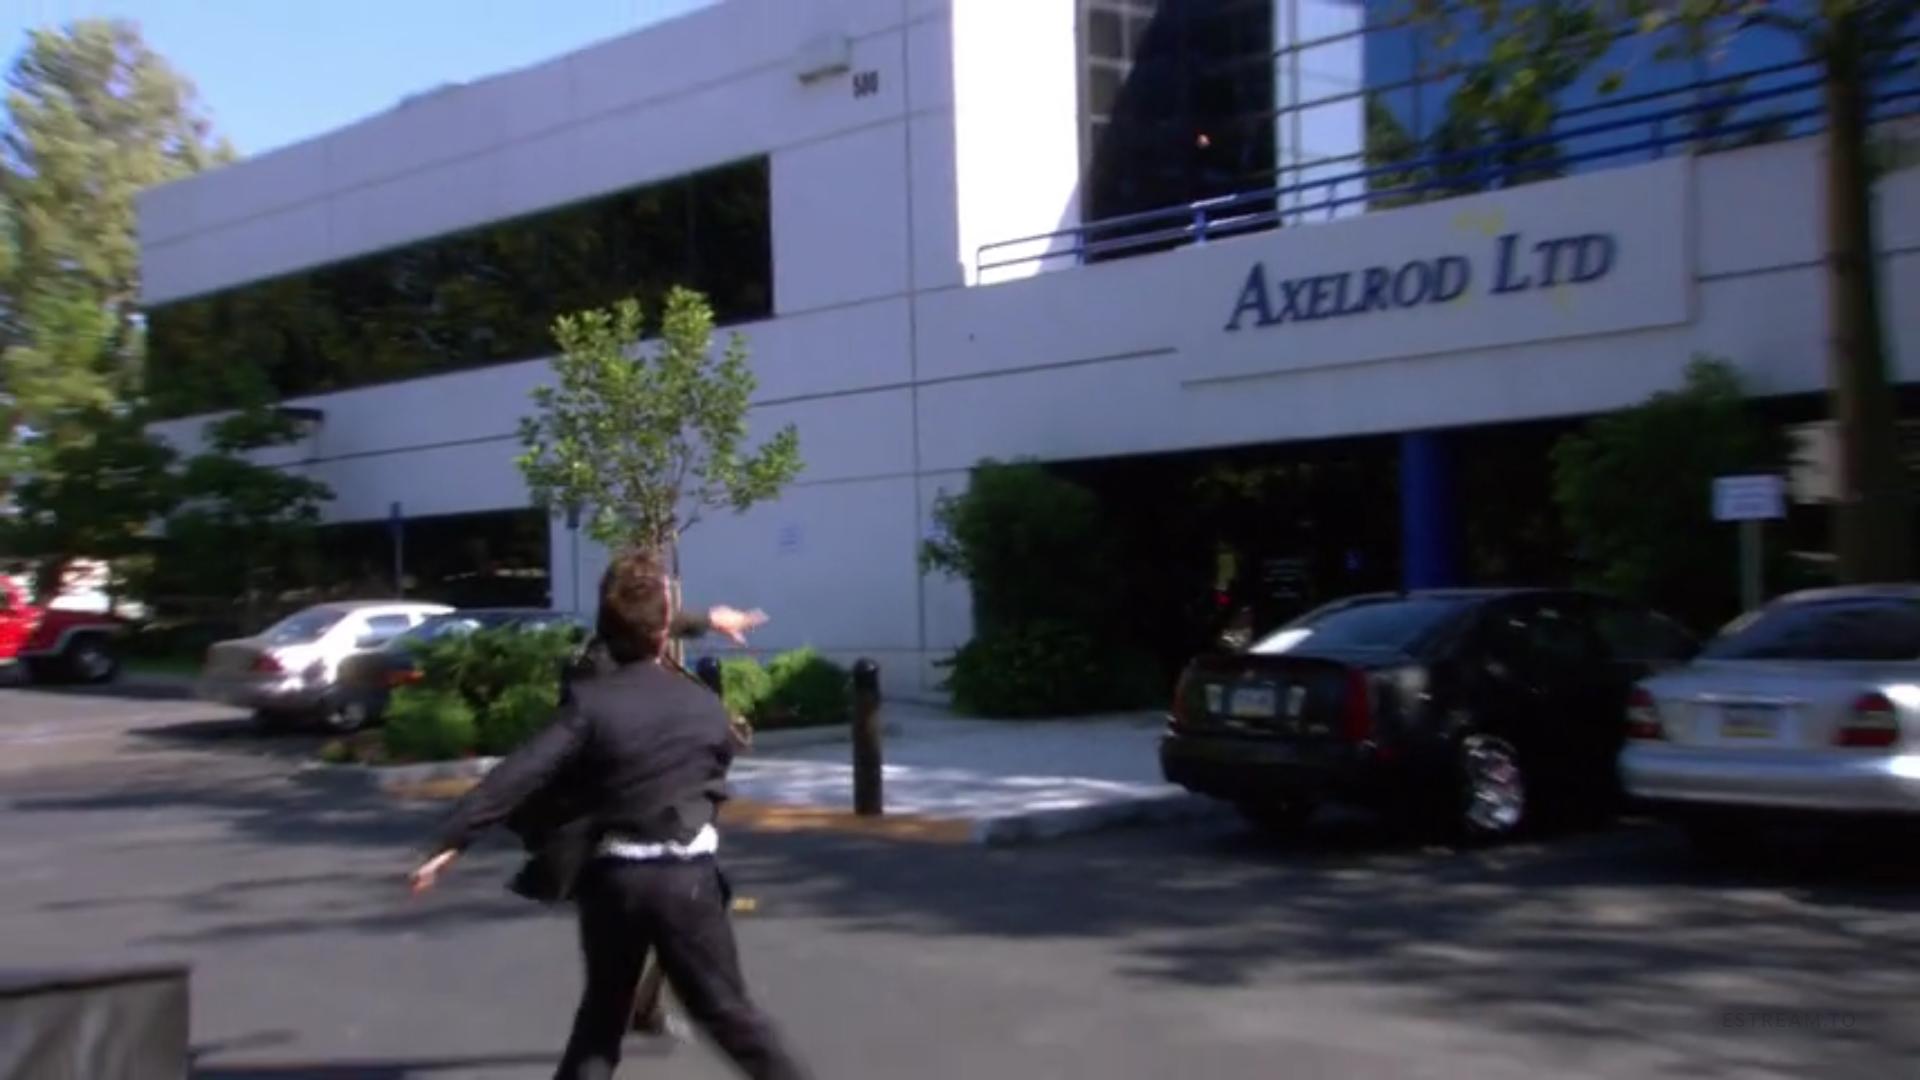 Axelrod Ltd.